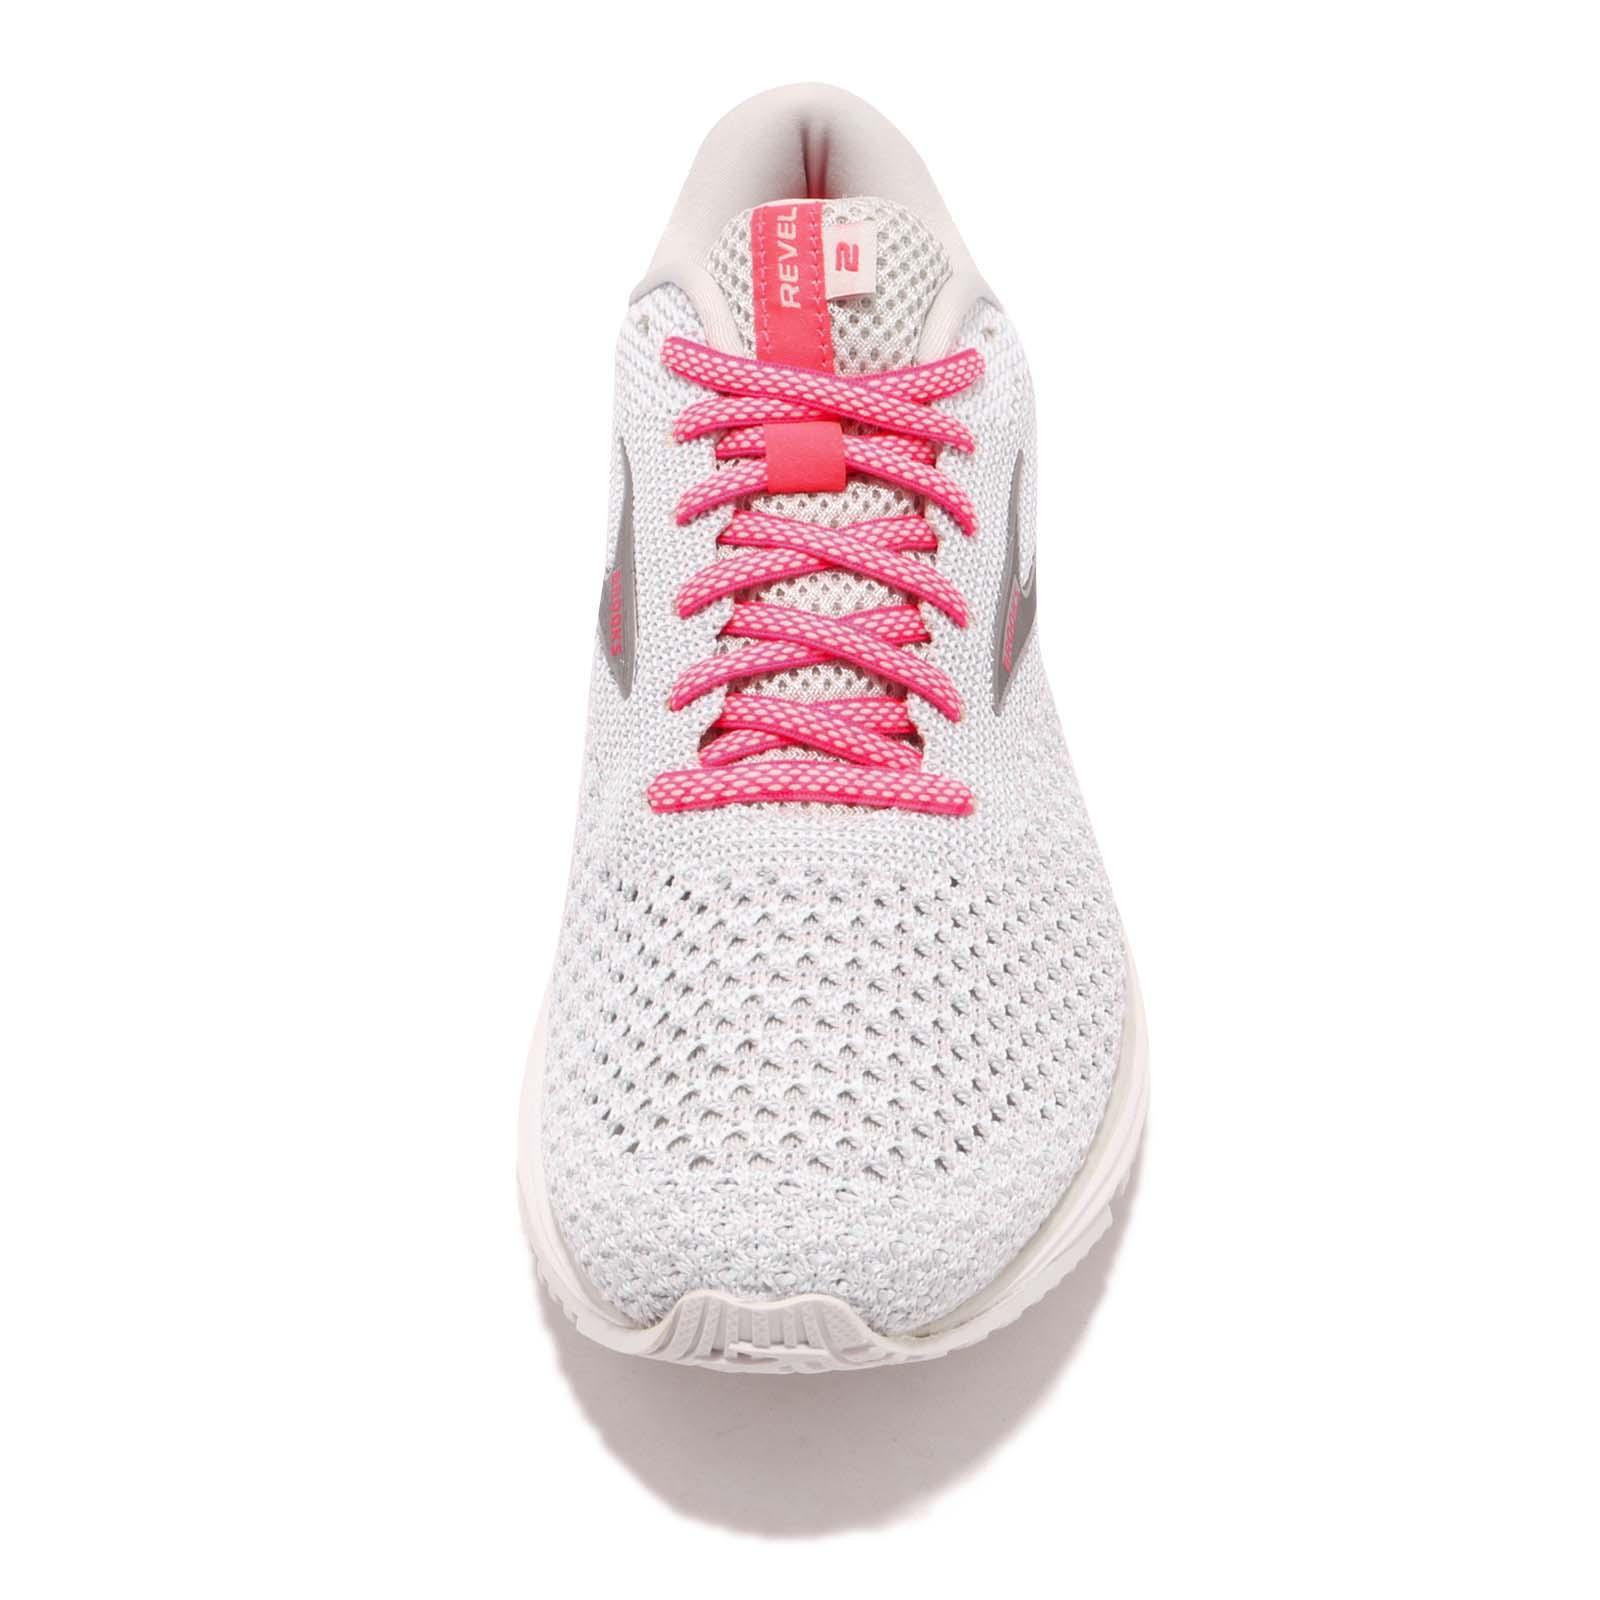 Brooks Revel 2 Black Purple Grey Women Running Training Shoes Sneakers 120281 1B